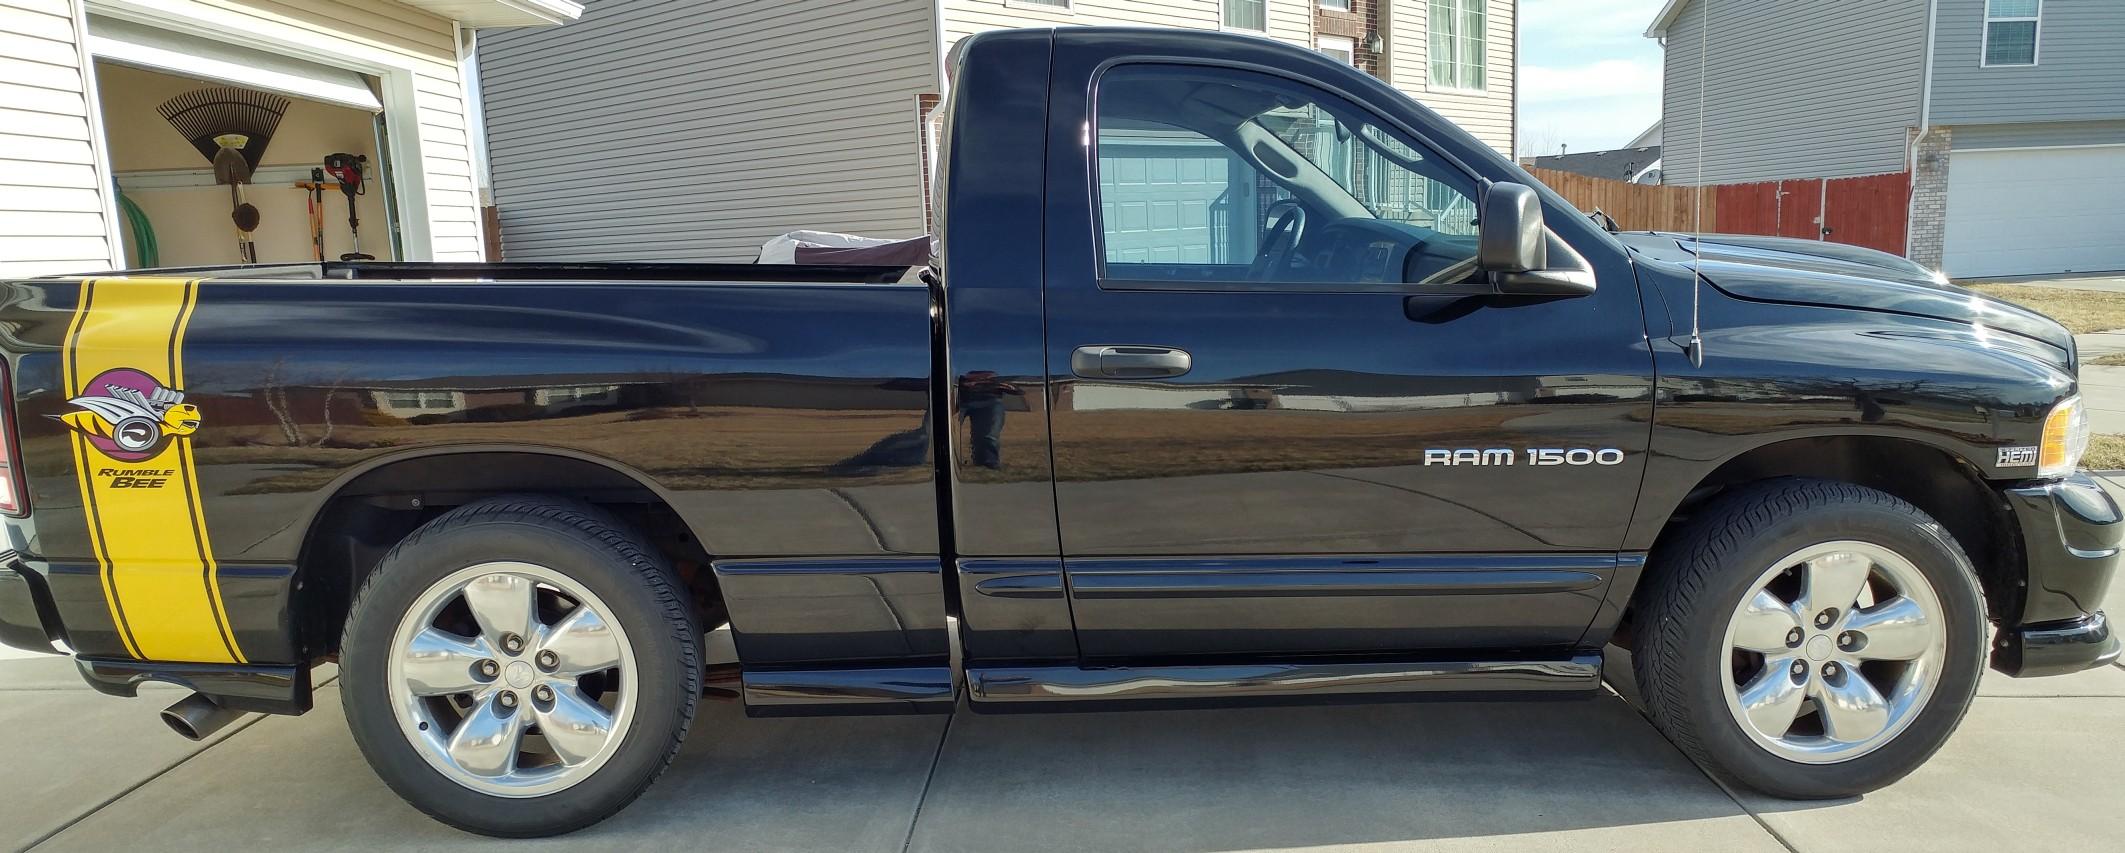 For Sale: 2004 Dodge Ram 1500 4x4 Rumble Bee